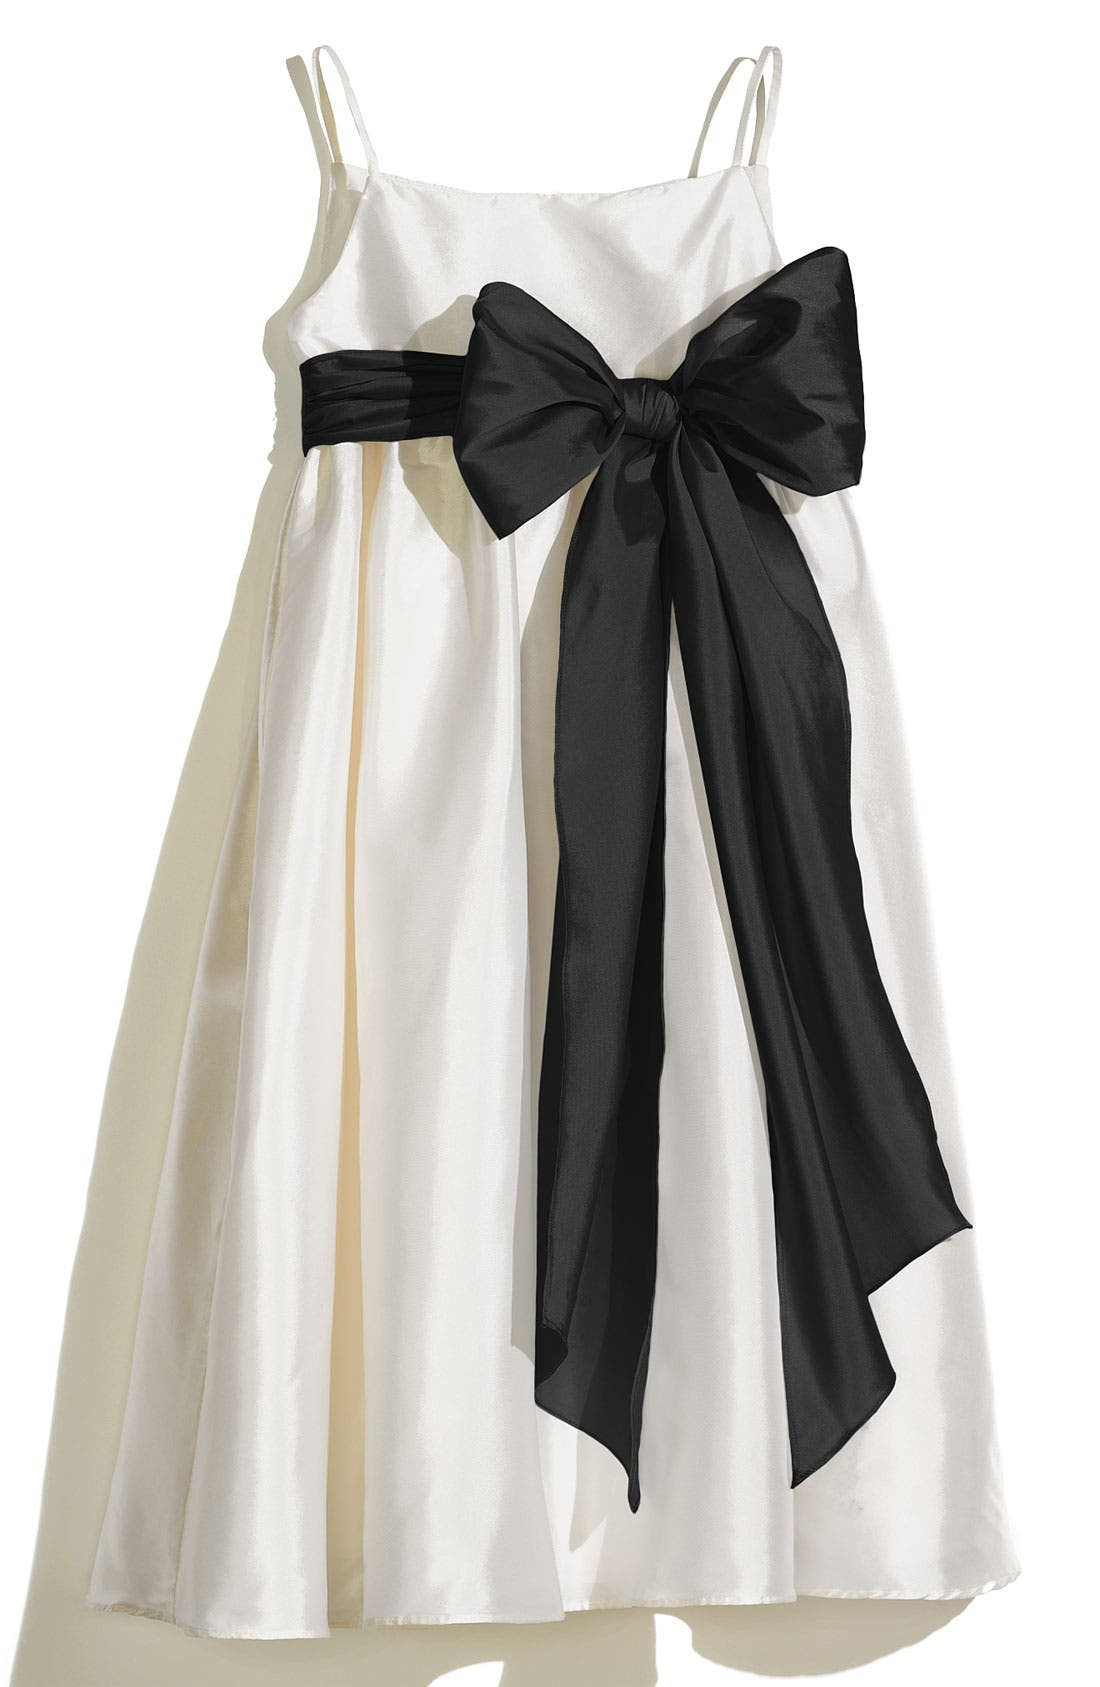 A-Line Dress with Sash,                         Main,                         color, Ivory/ Black